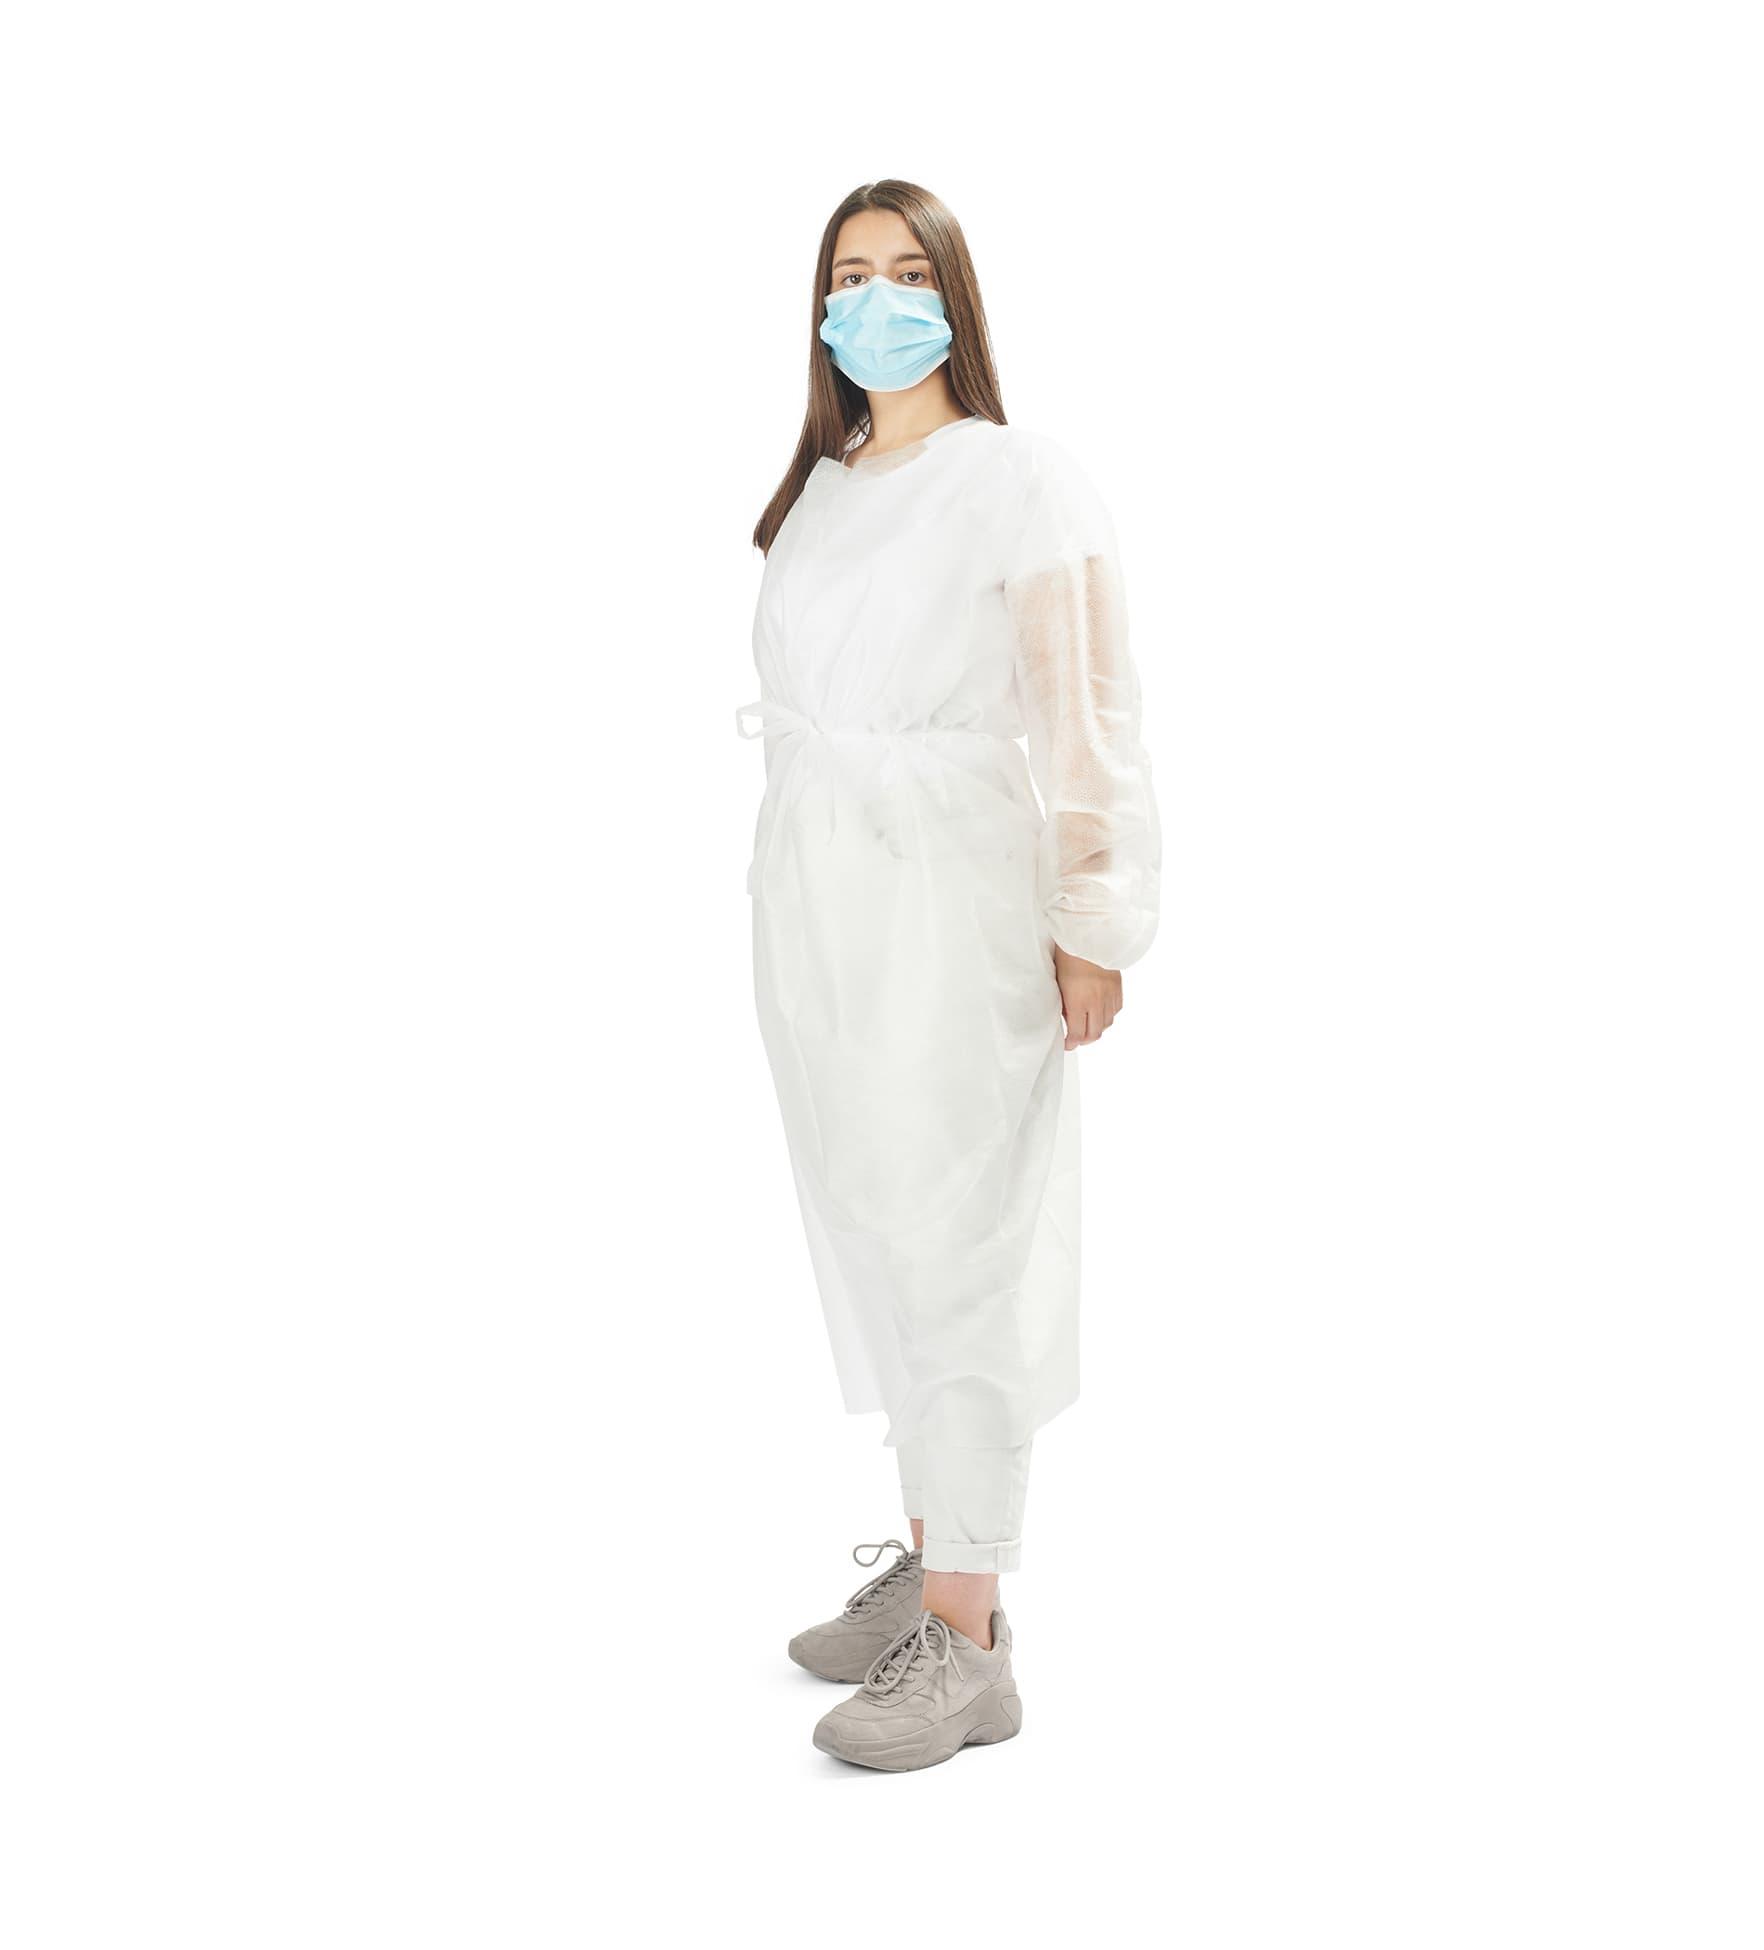 batas hidrófugas 25g 1 - 25g water repellent gowns - clothe protect